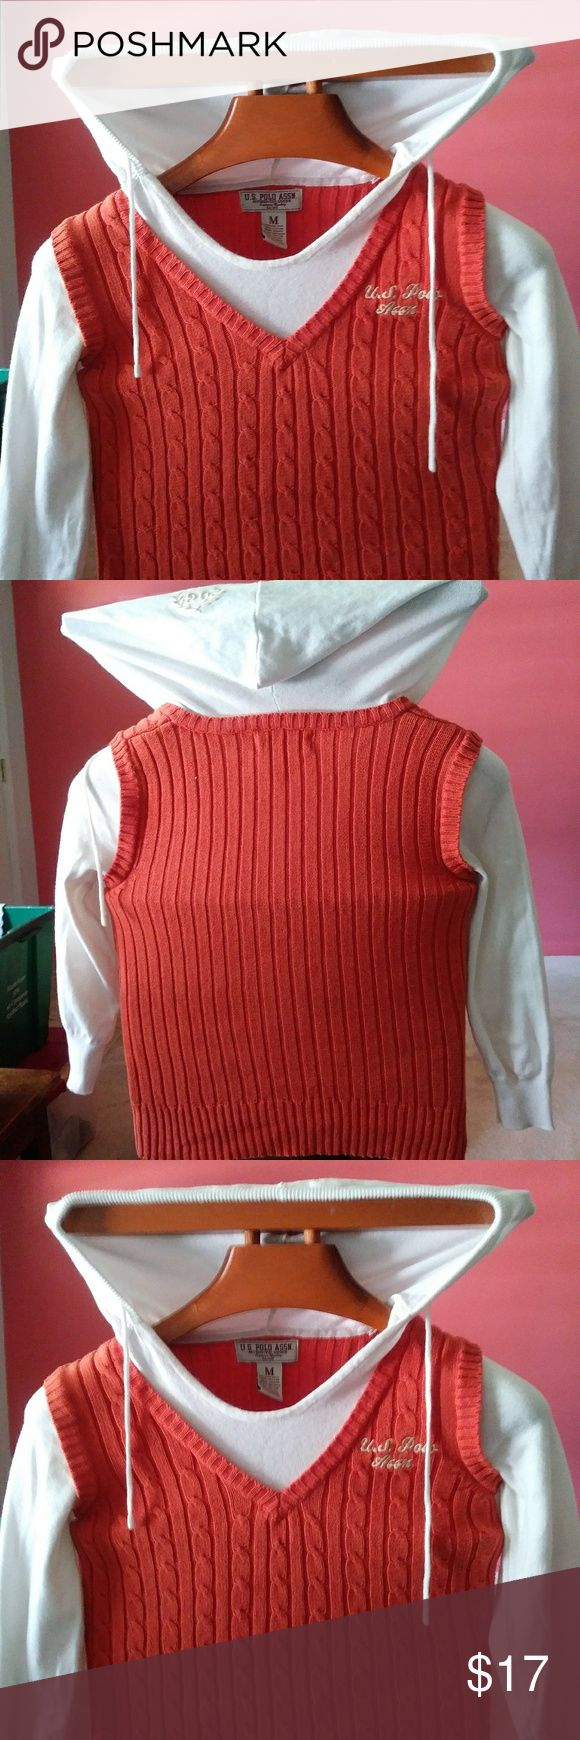 Polo szMed hoodie $17 $17 plus free gift Polo szMed hoodie $17 $17 plus free gift any item in this closet priced $15 or less u.s. polo Association Tops Sweatshirts & Hoodies